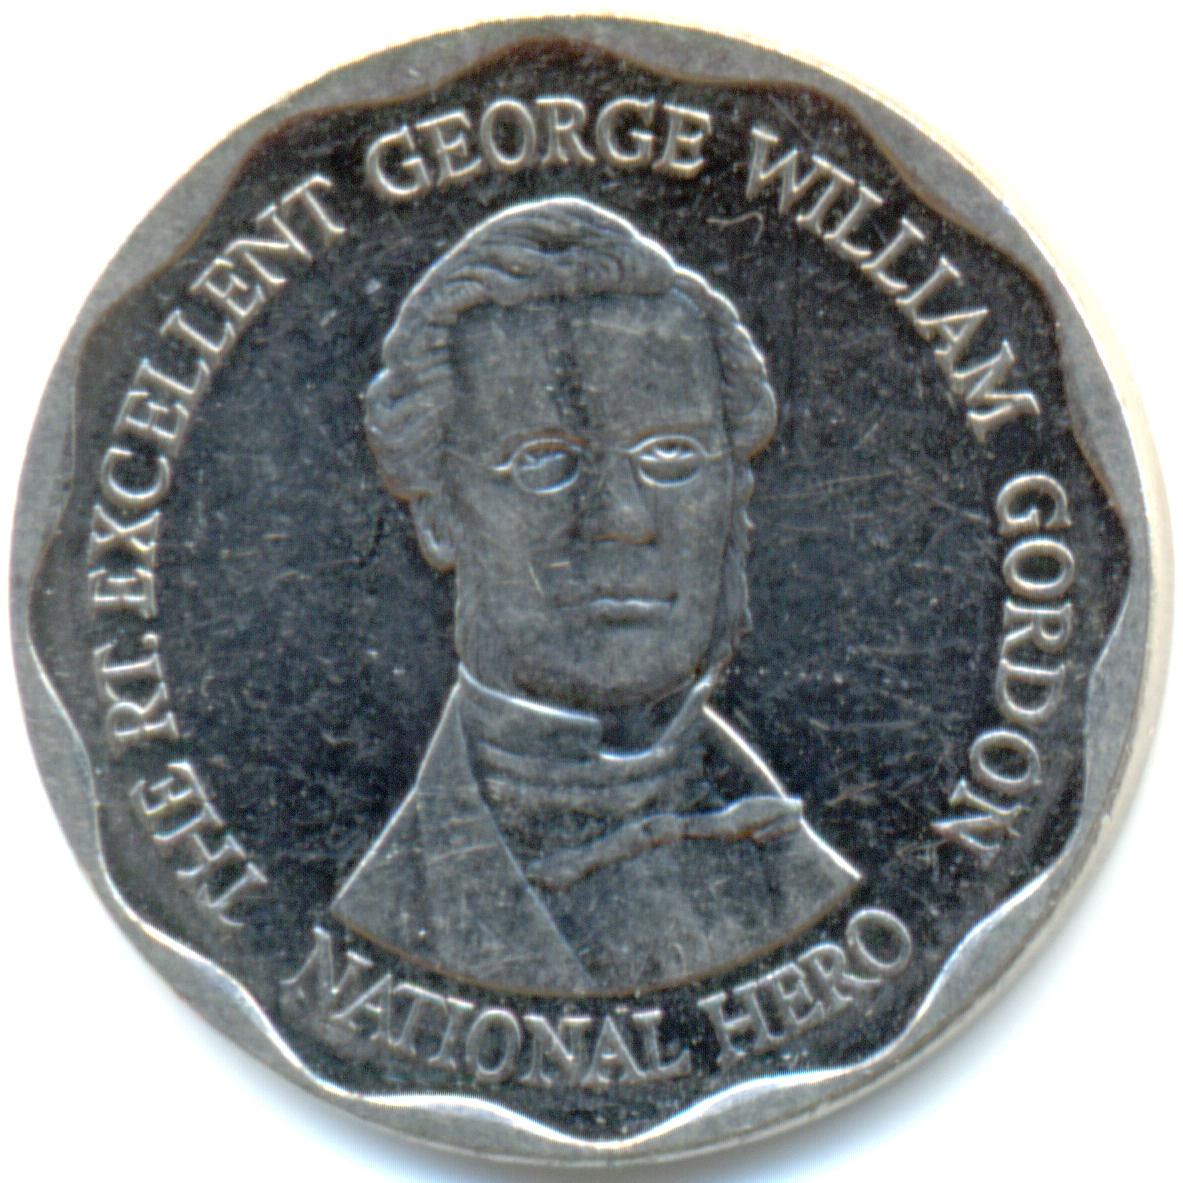 jamaica 10 dollar coin 2015